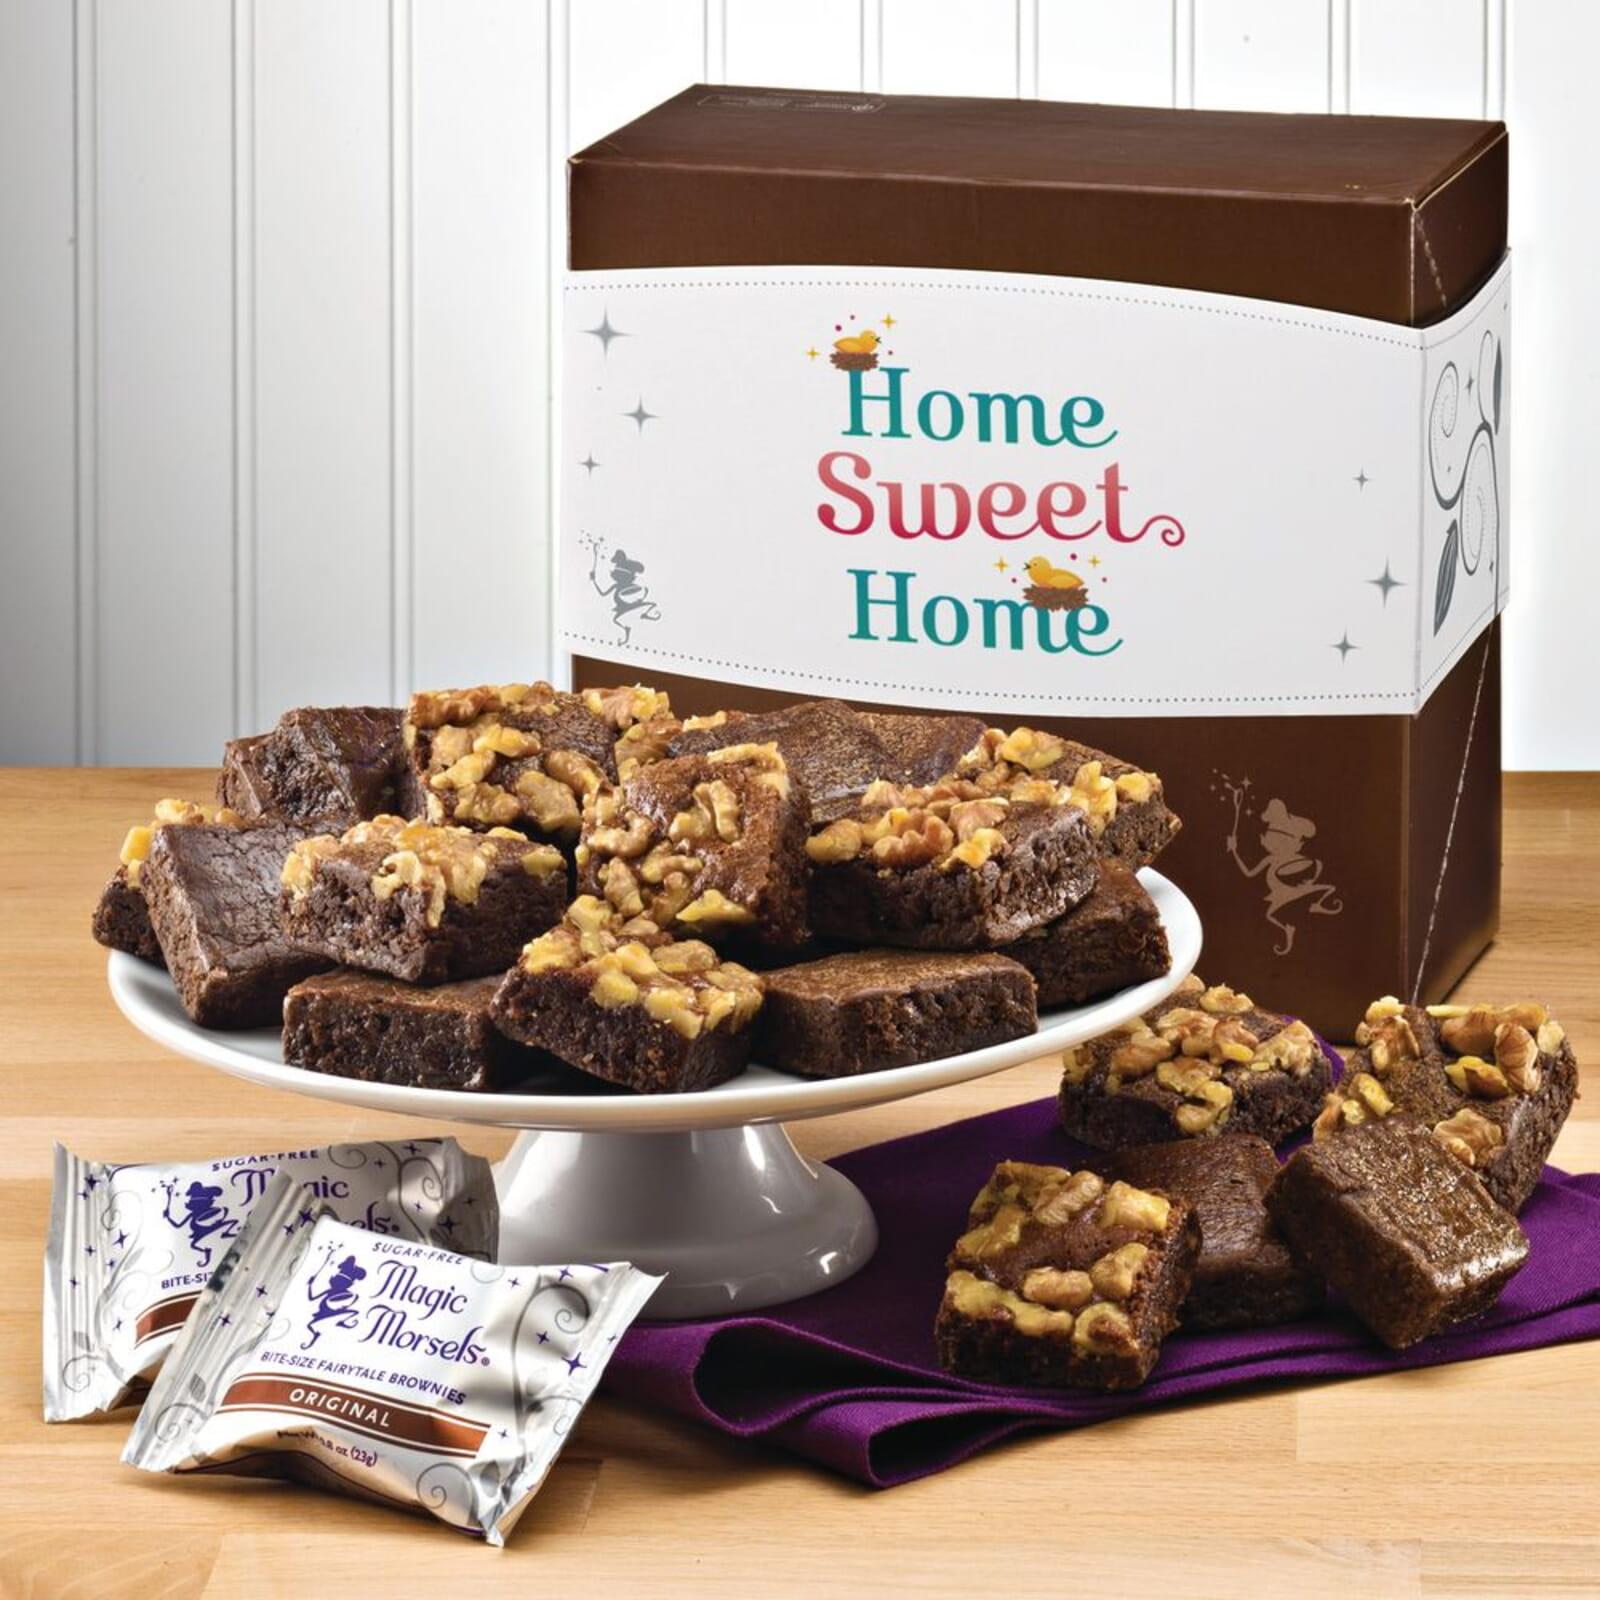 Home Sweet Home Sugar-Free Morsel 48